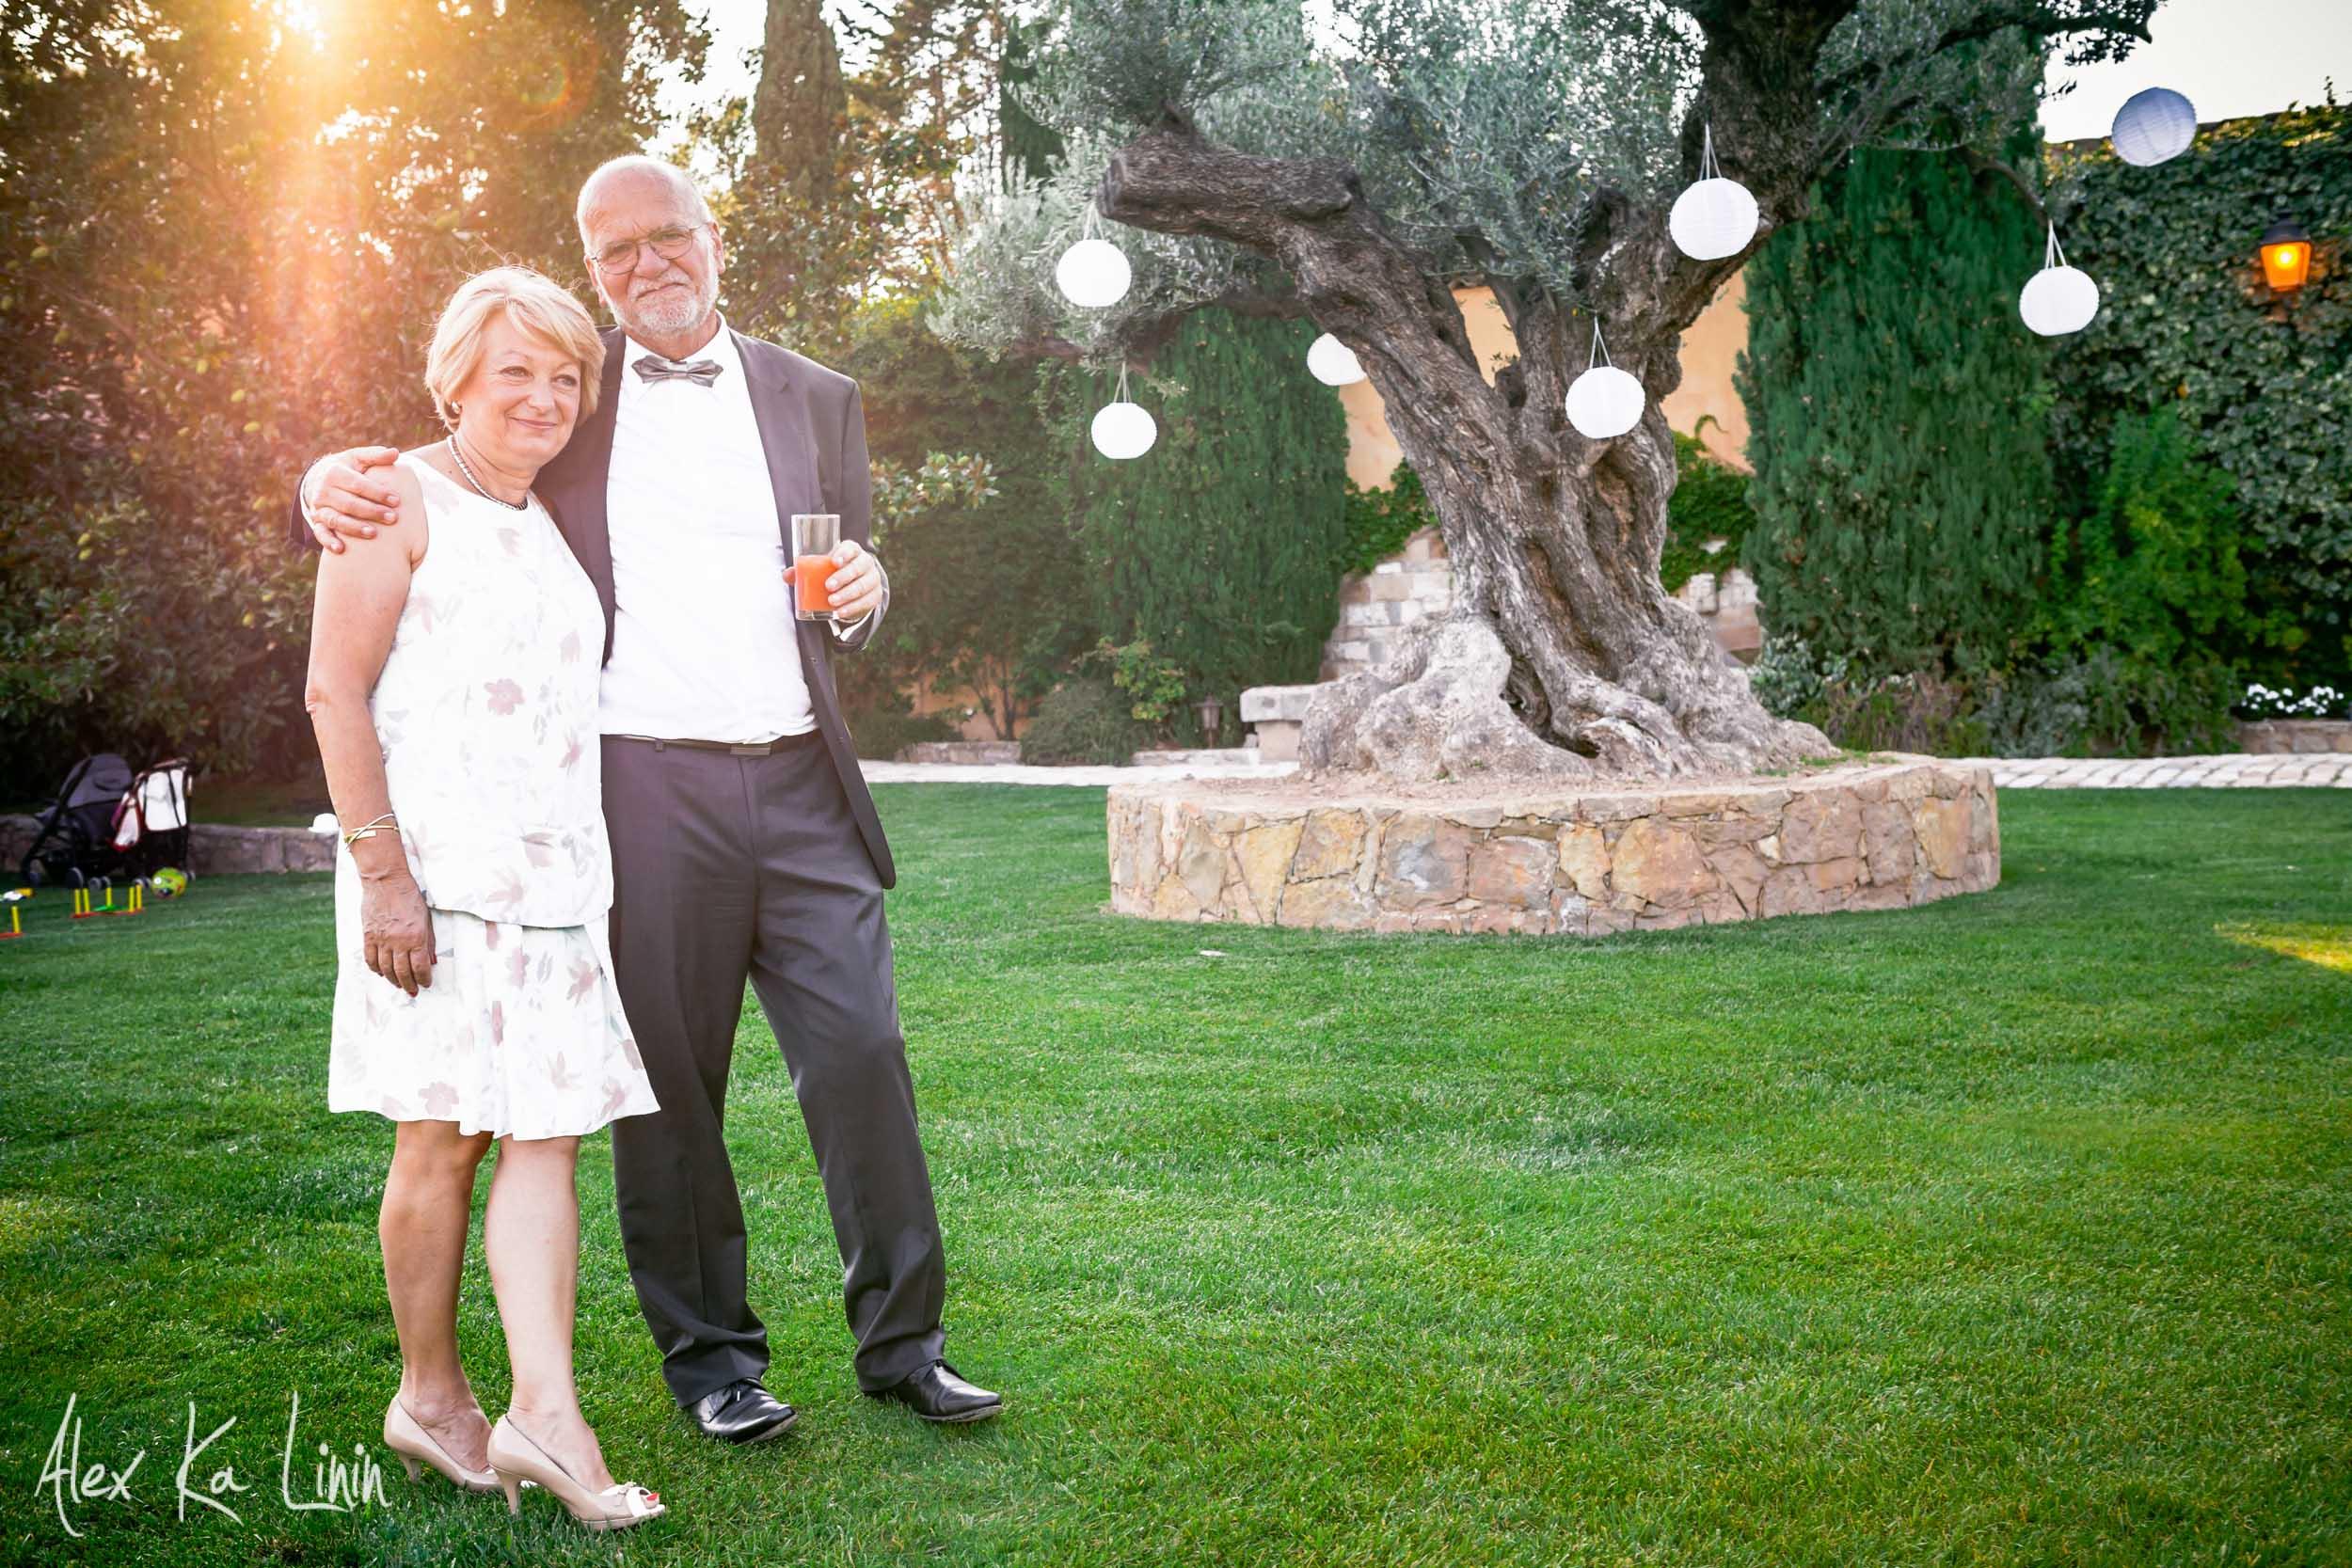 AlexKa_wedding_mariage_photographer-41.jpg